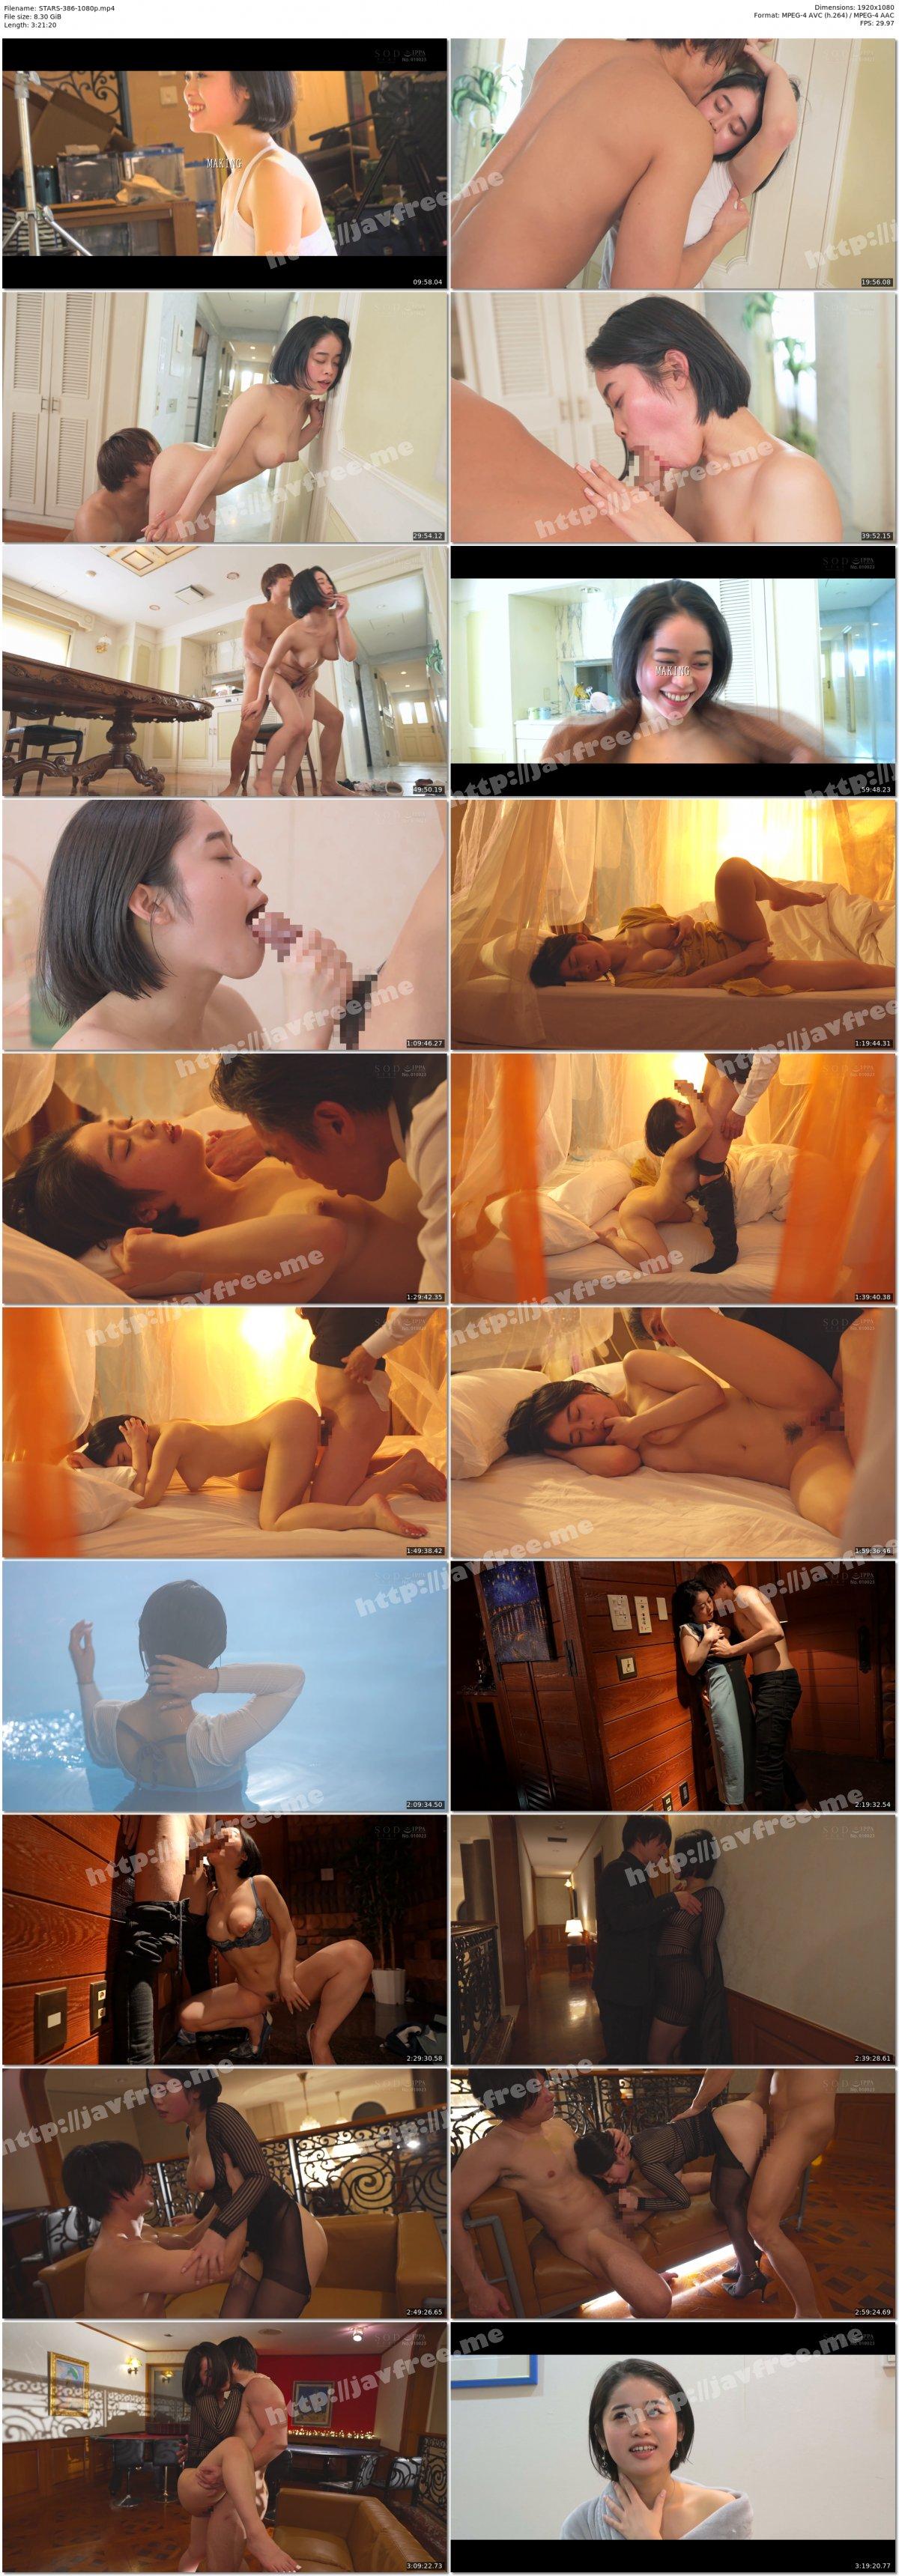 [HD][STARS-386] 恍惚。「快楽に溺れたい」MINAMO 超大型新人 - image STARS-386-1080p on https://javfree.me